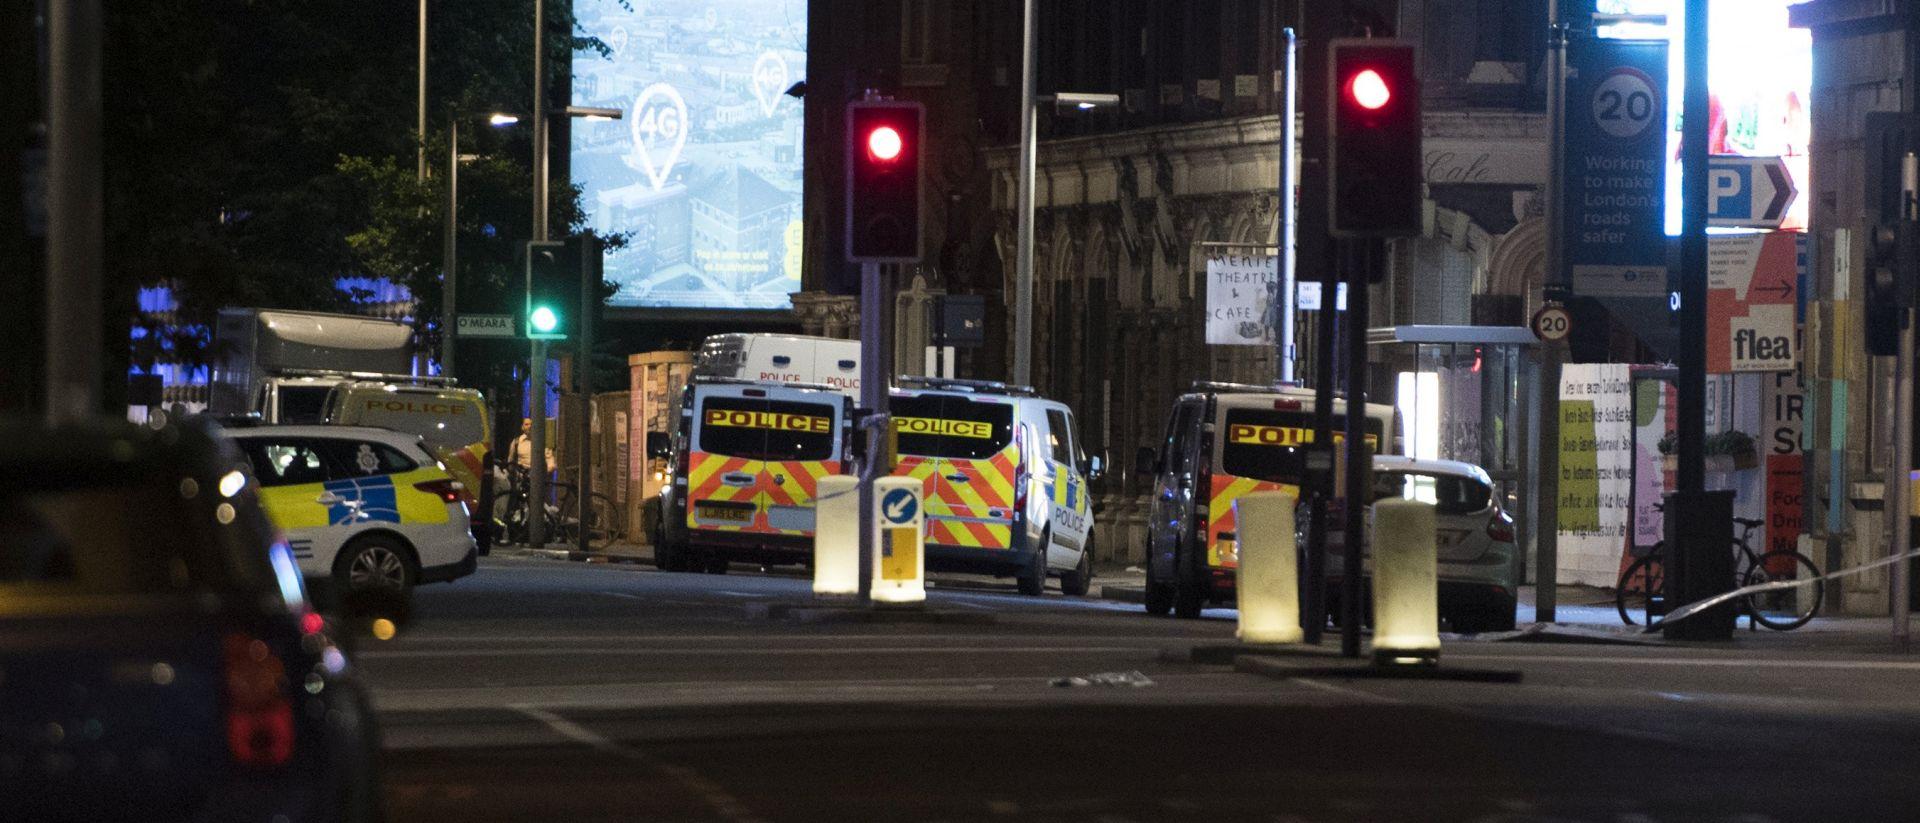 Trump prozvao londonskog gradonačelnika dan nakon napada